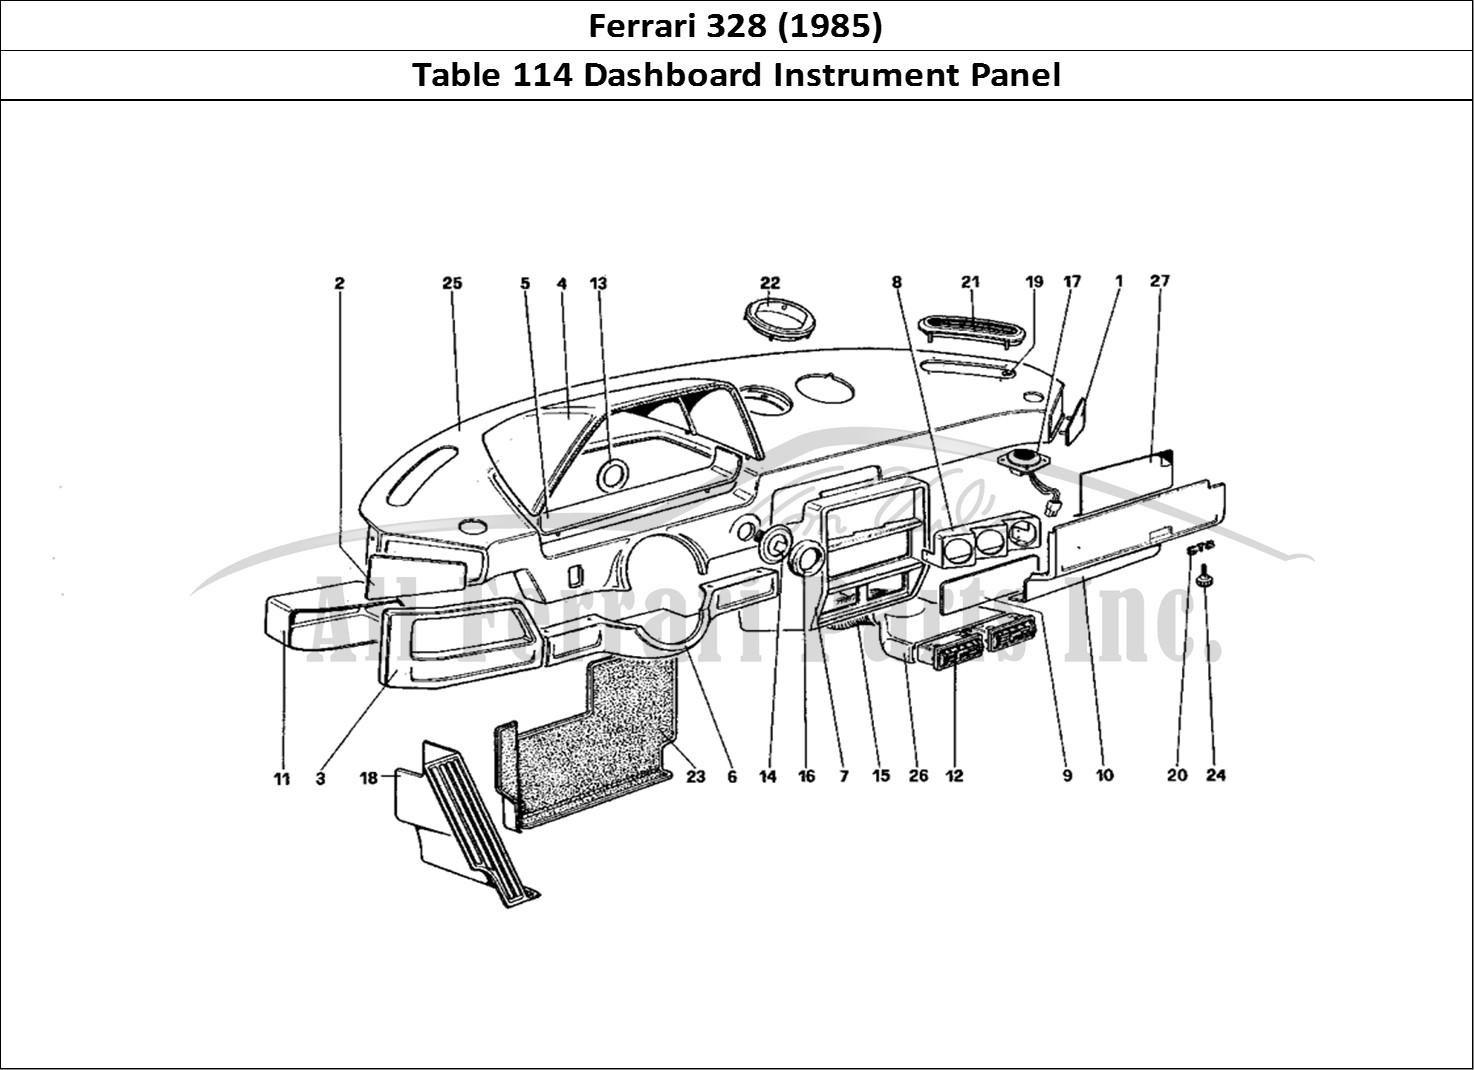 Buy original Ferrari 328 (1985) 114 Dashboard Instrument